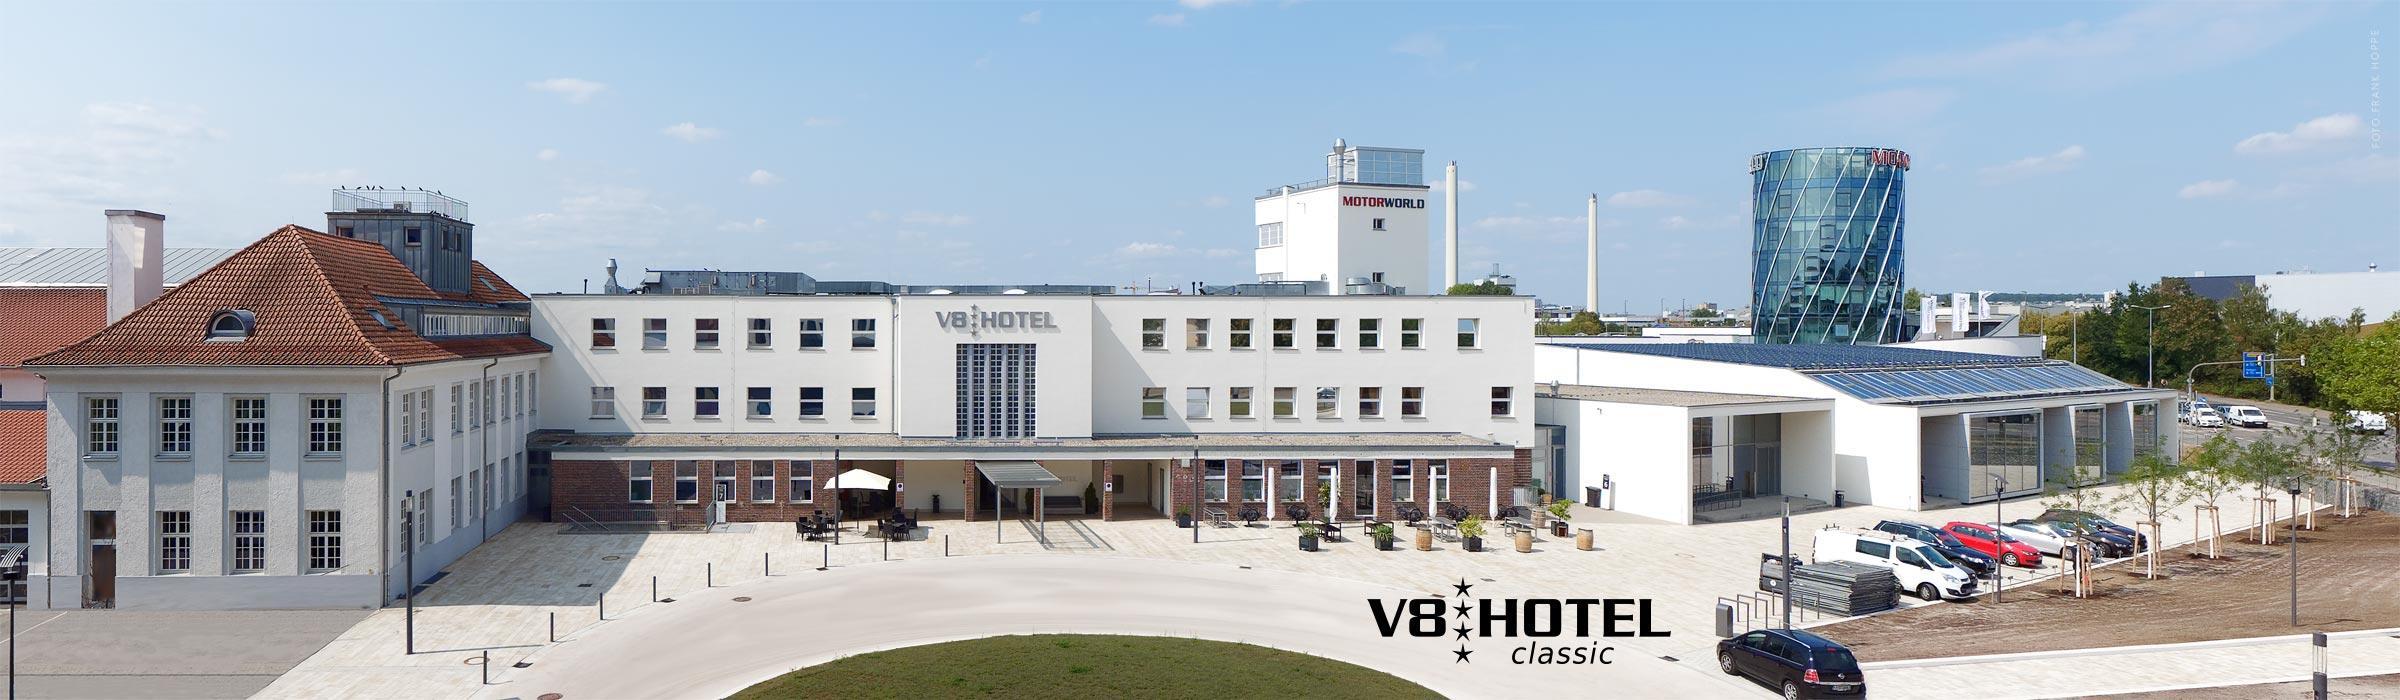 V8 Hotel Classic